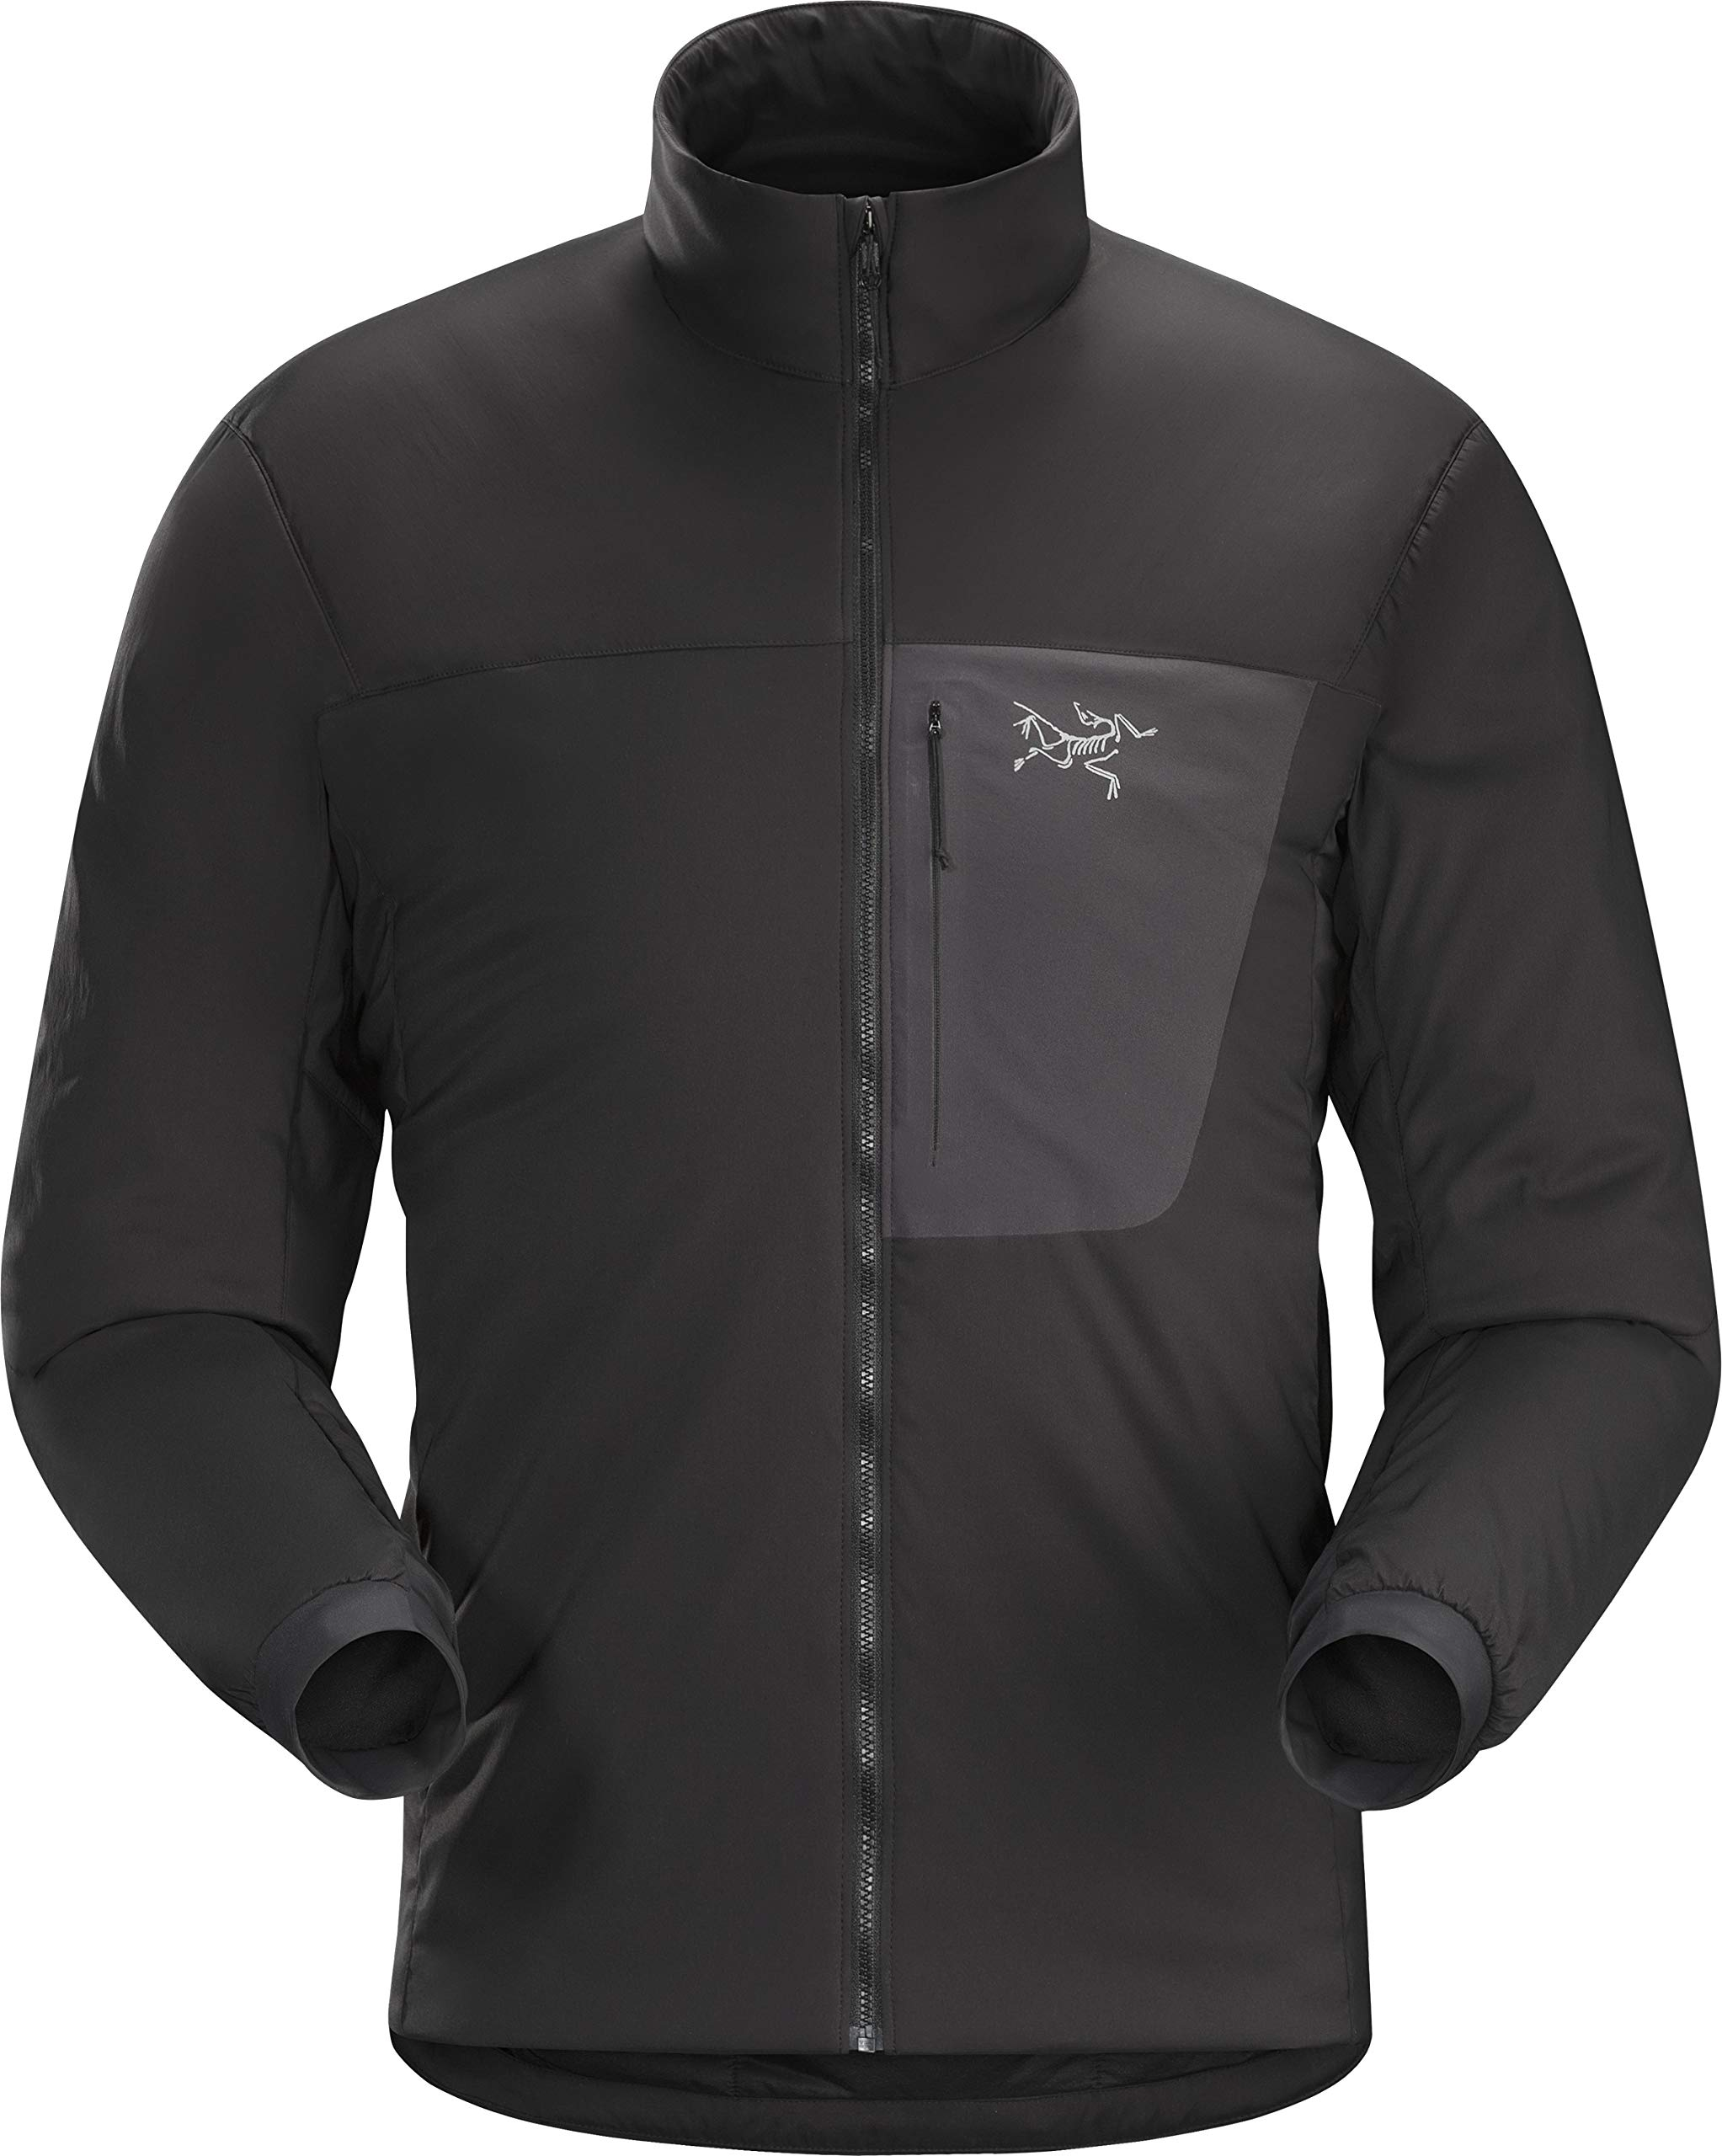 Arcteryx Proton Jacket Black Large